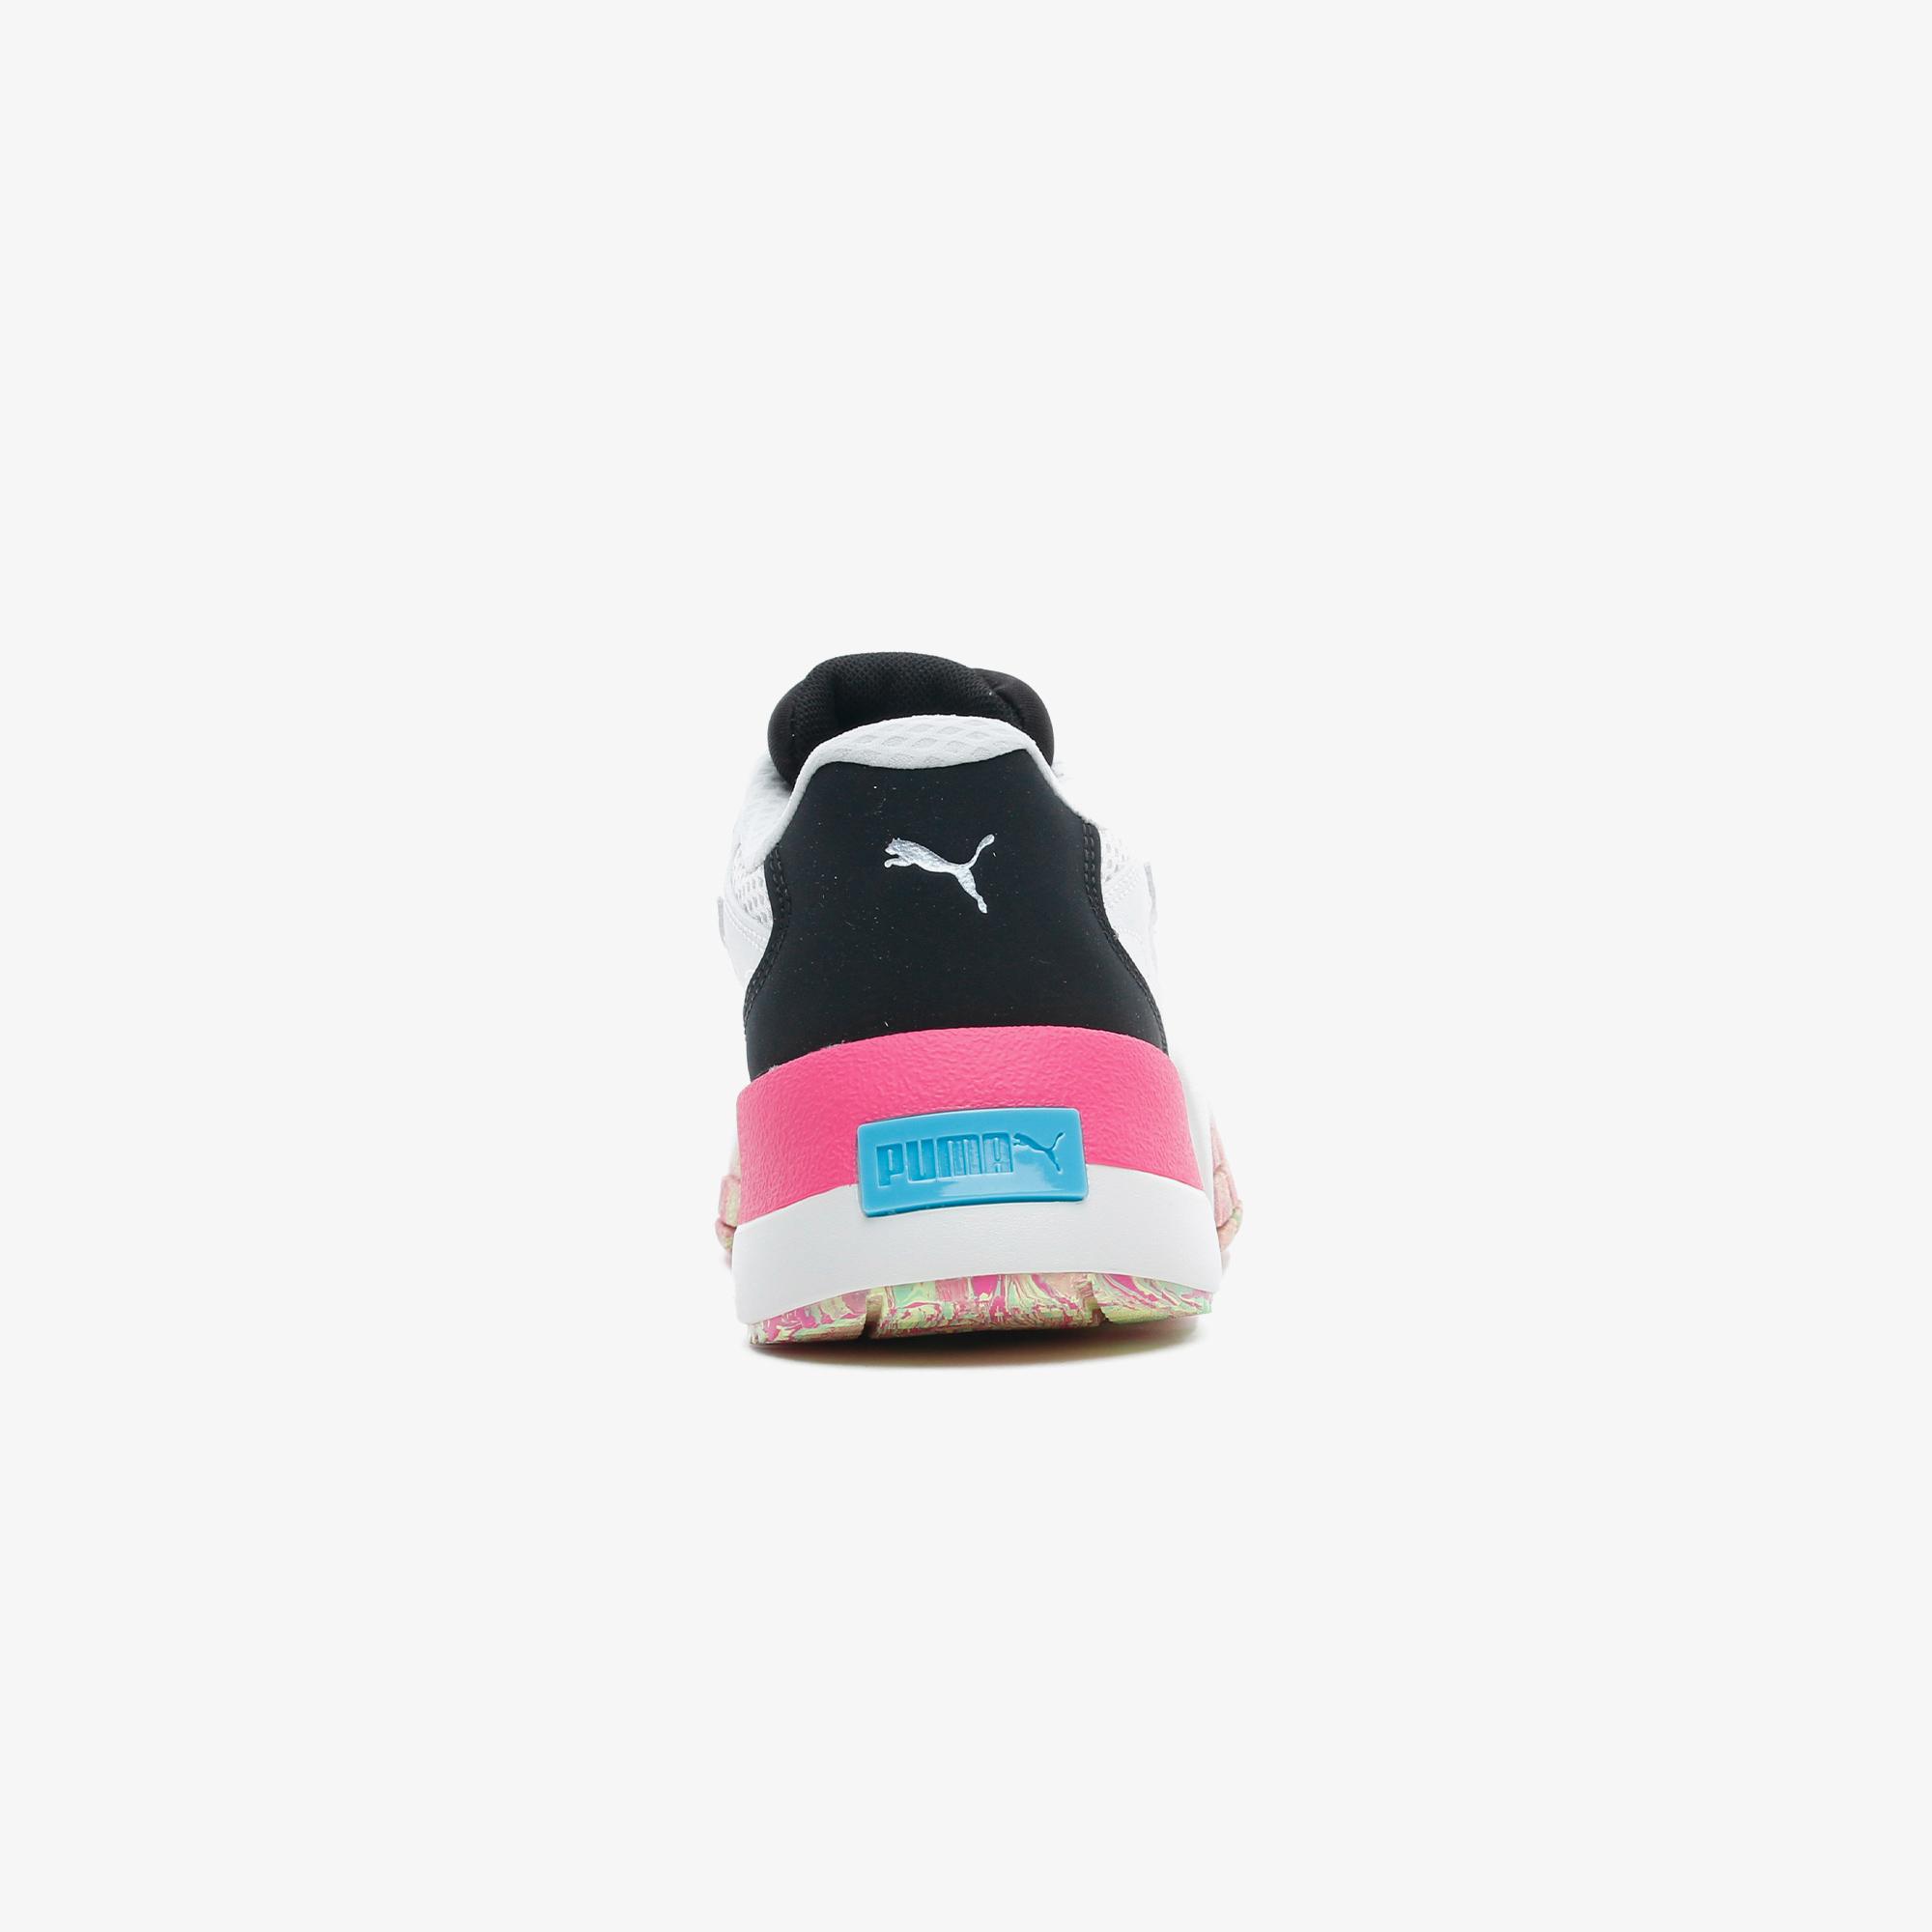 Puma Hedra Chaos Kadın Krem Spor Ayakkabı